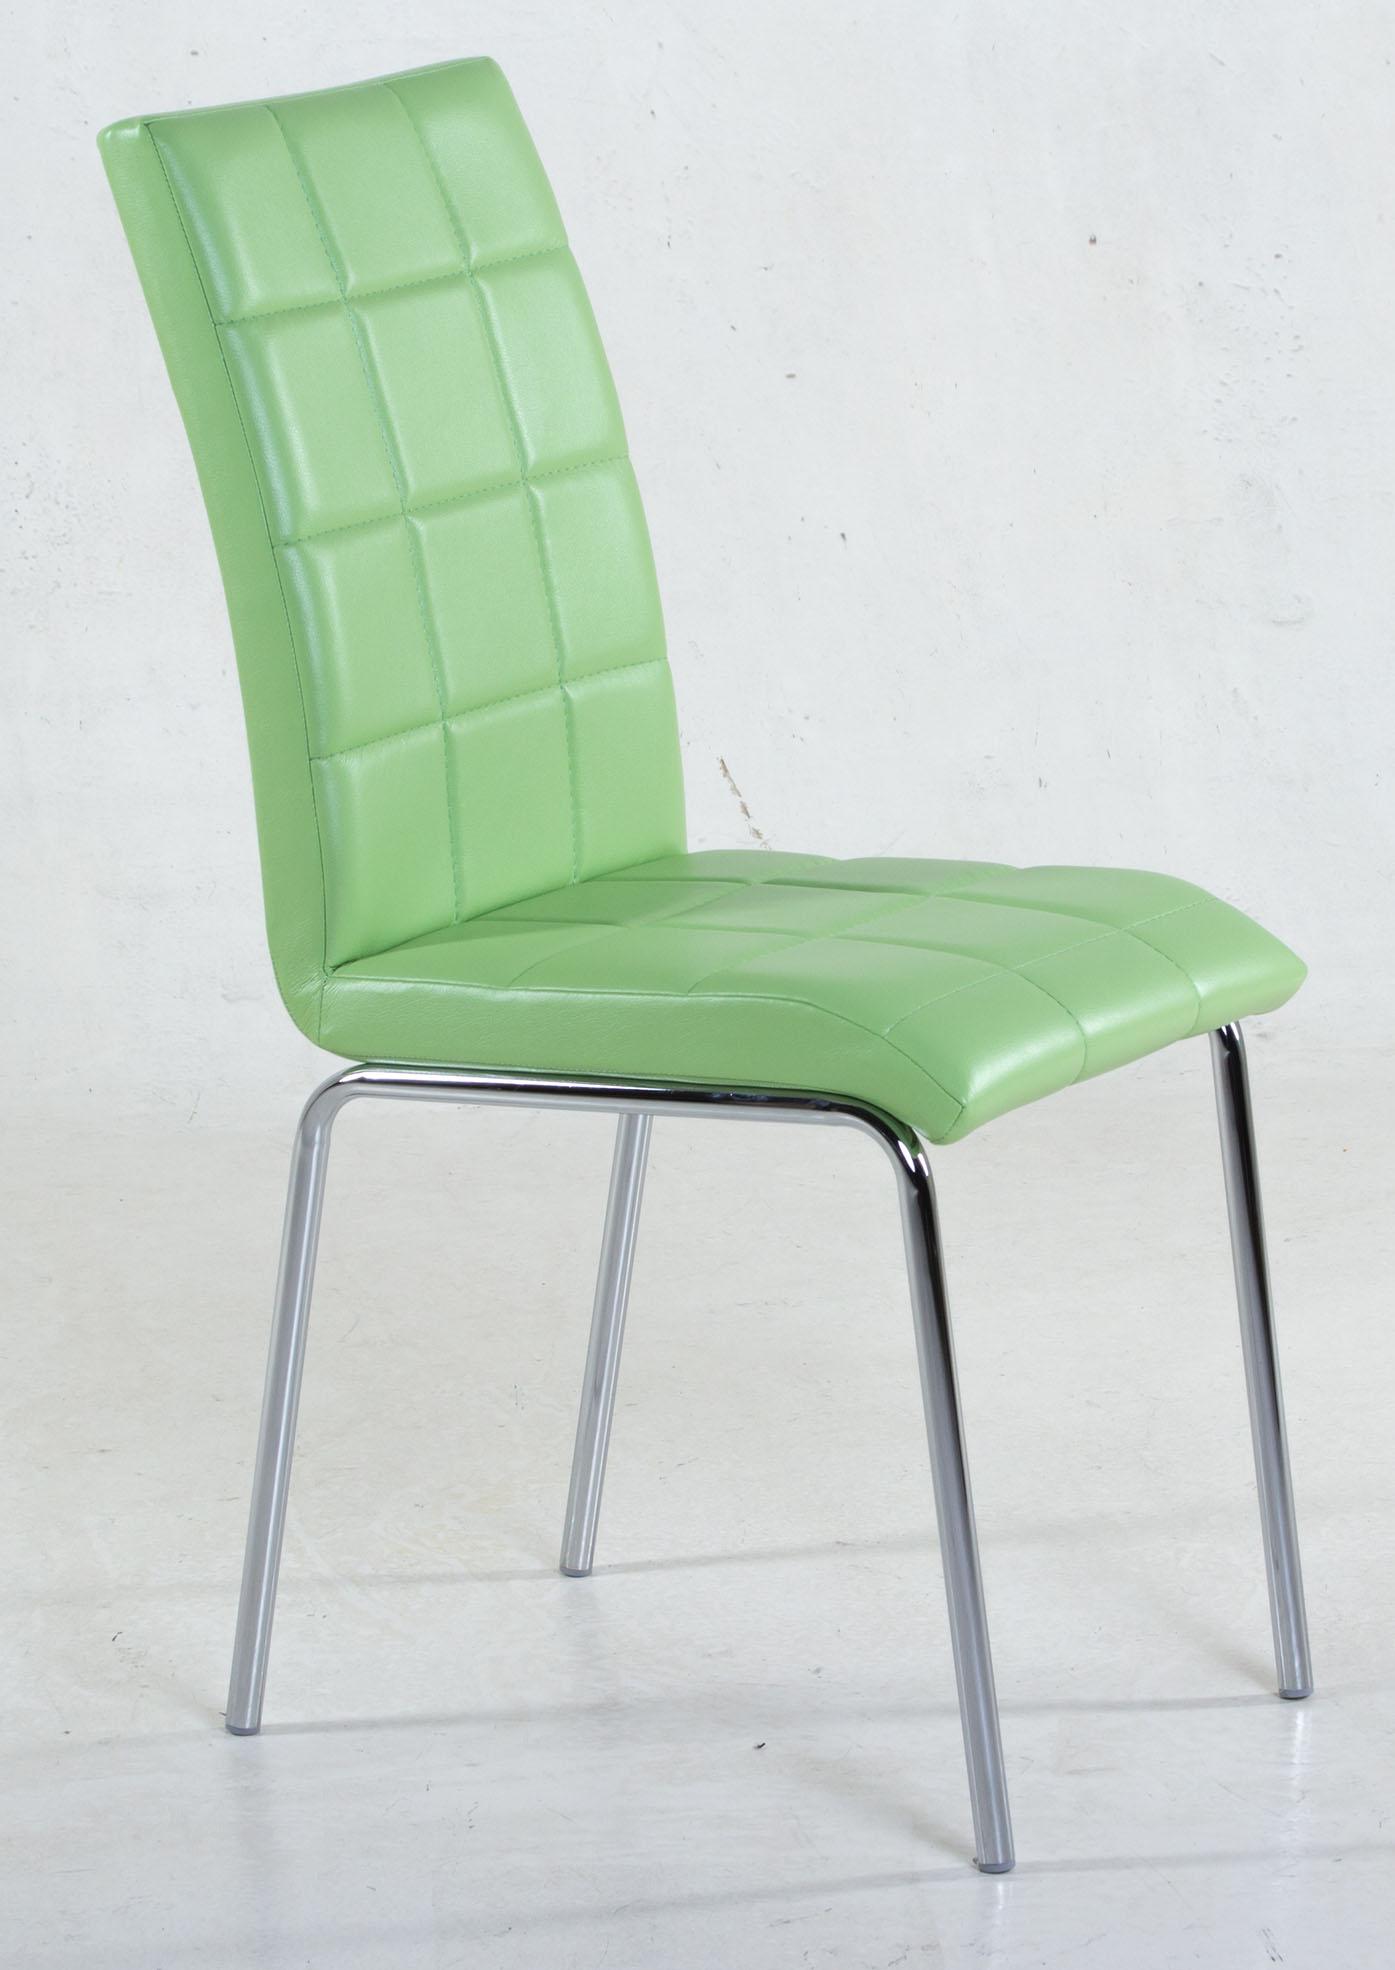 стул Эмполи